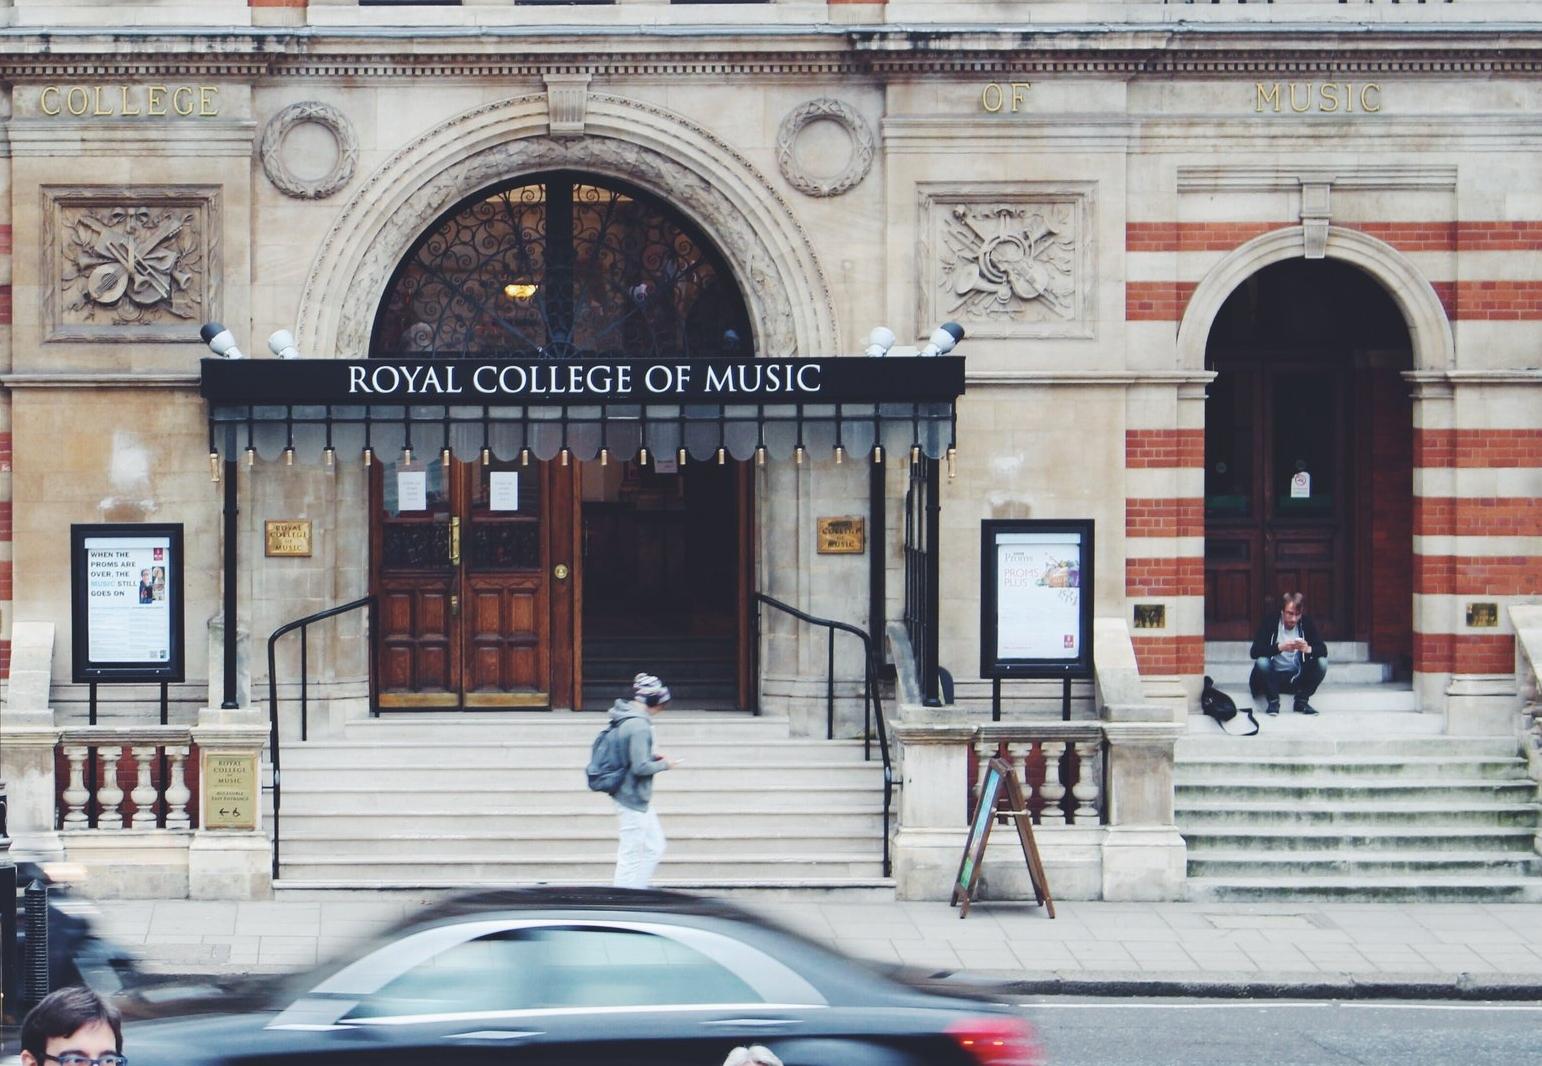 Royal College Of Music.jpg